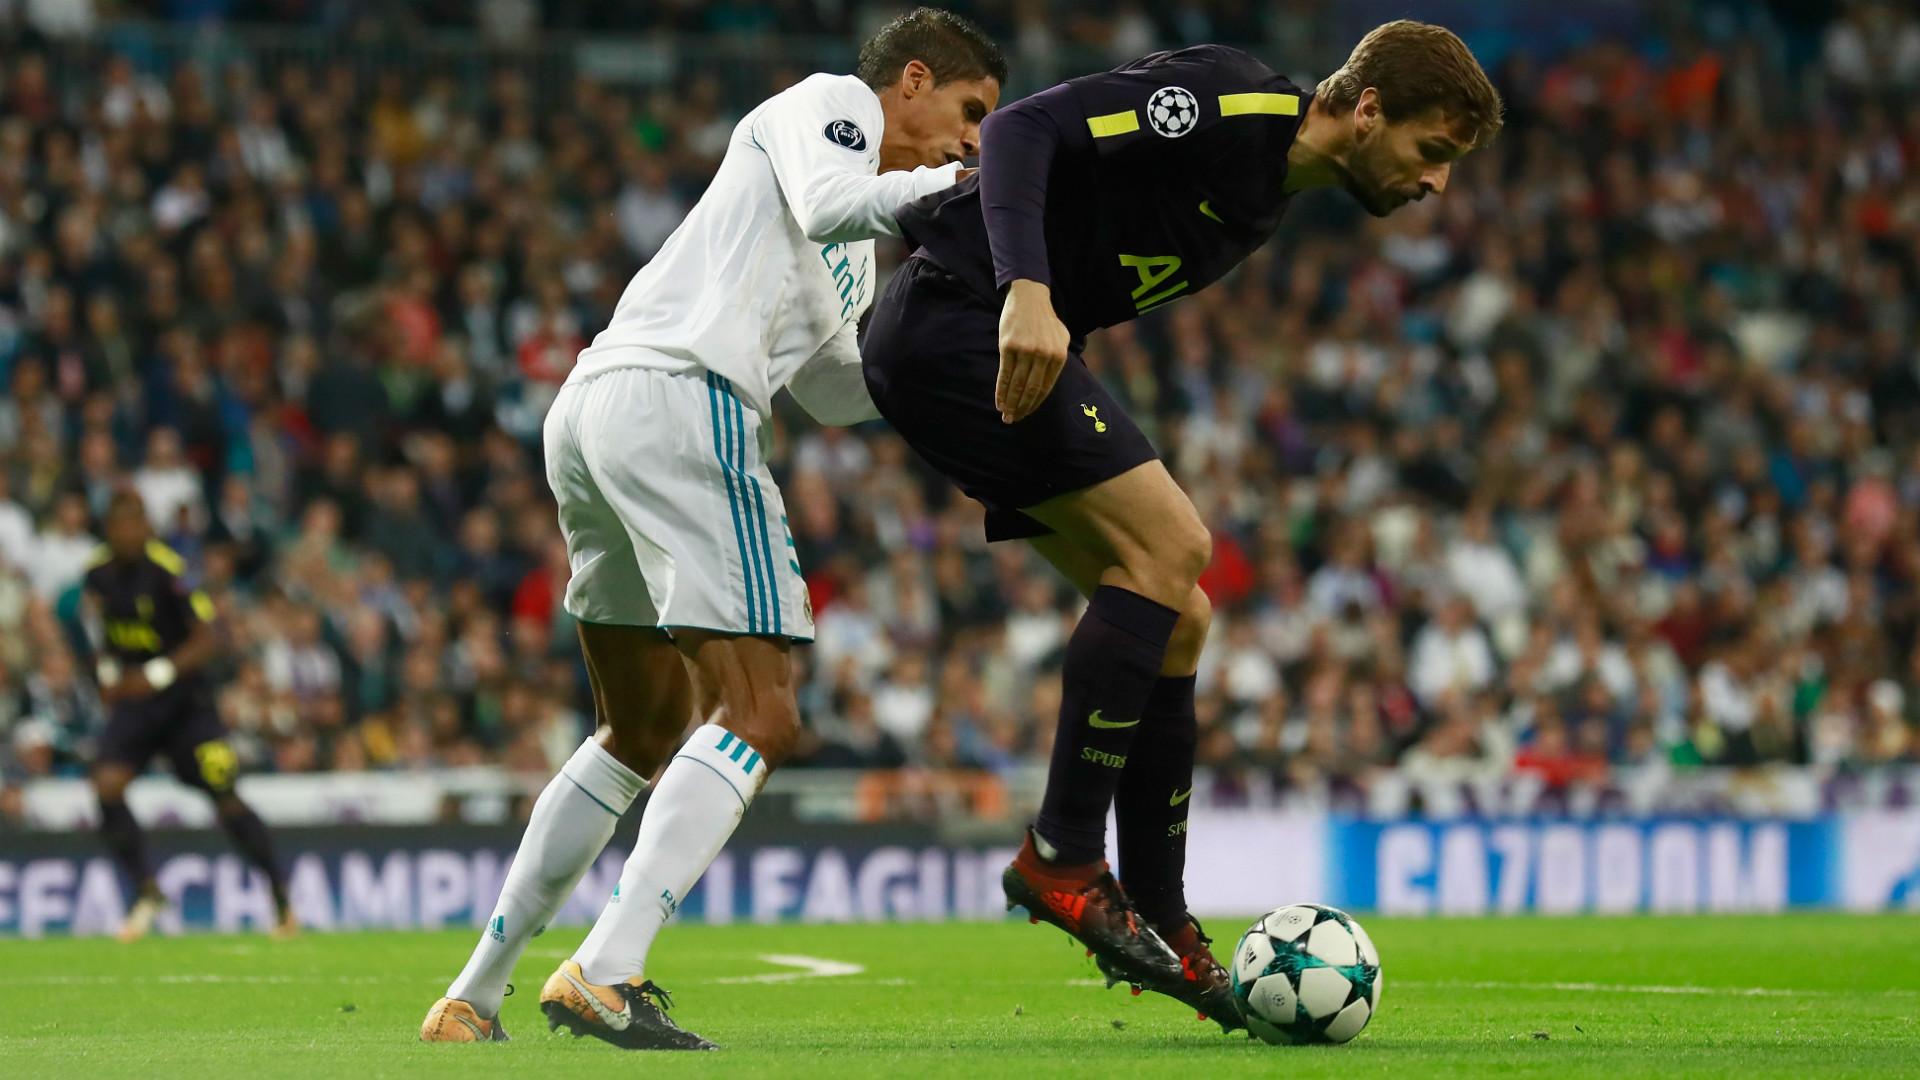 VARANE LLORENTE REAL MADRID TOTTENHAM CHAMPIONS LEAGUE